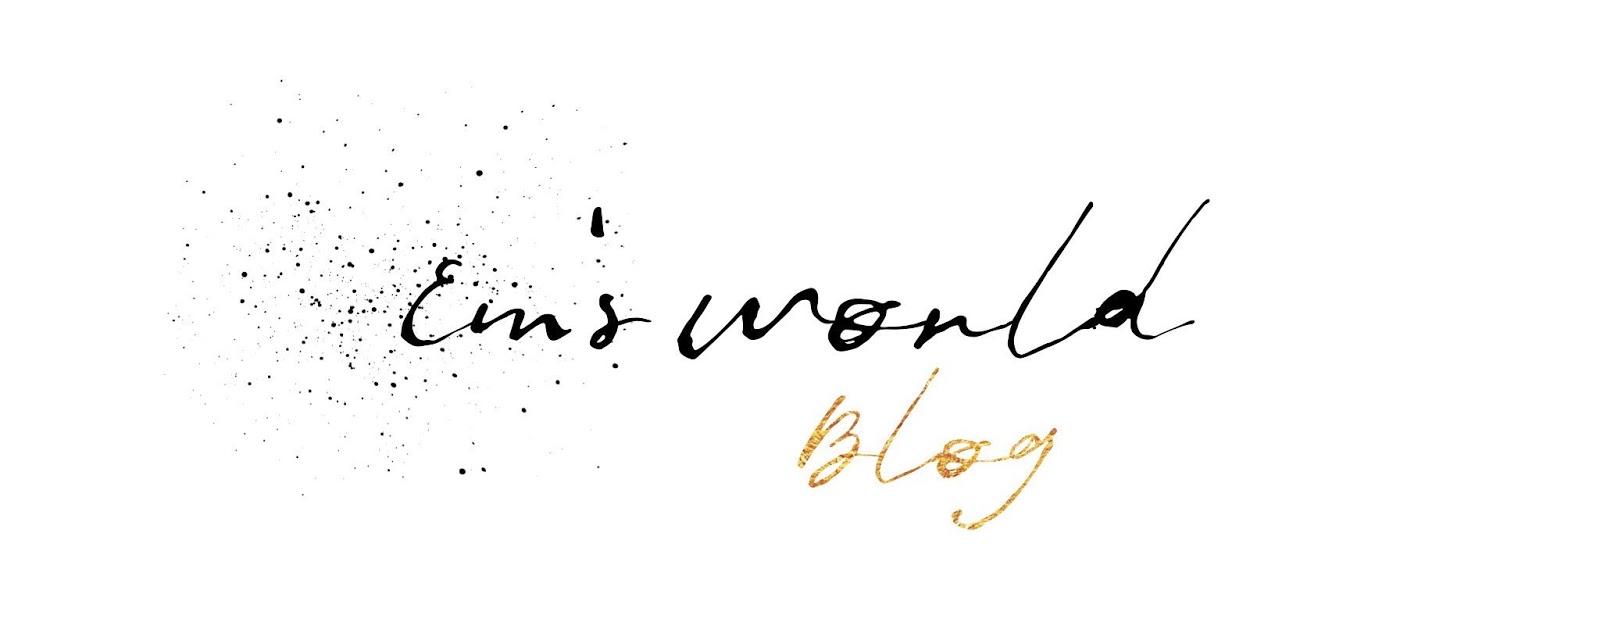 Blog header for Rmsworldblog